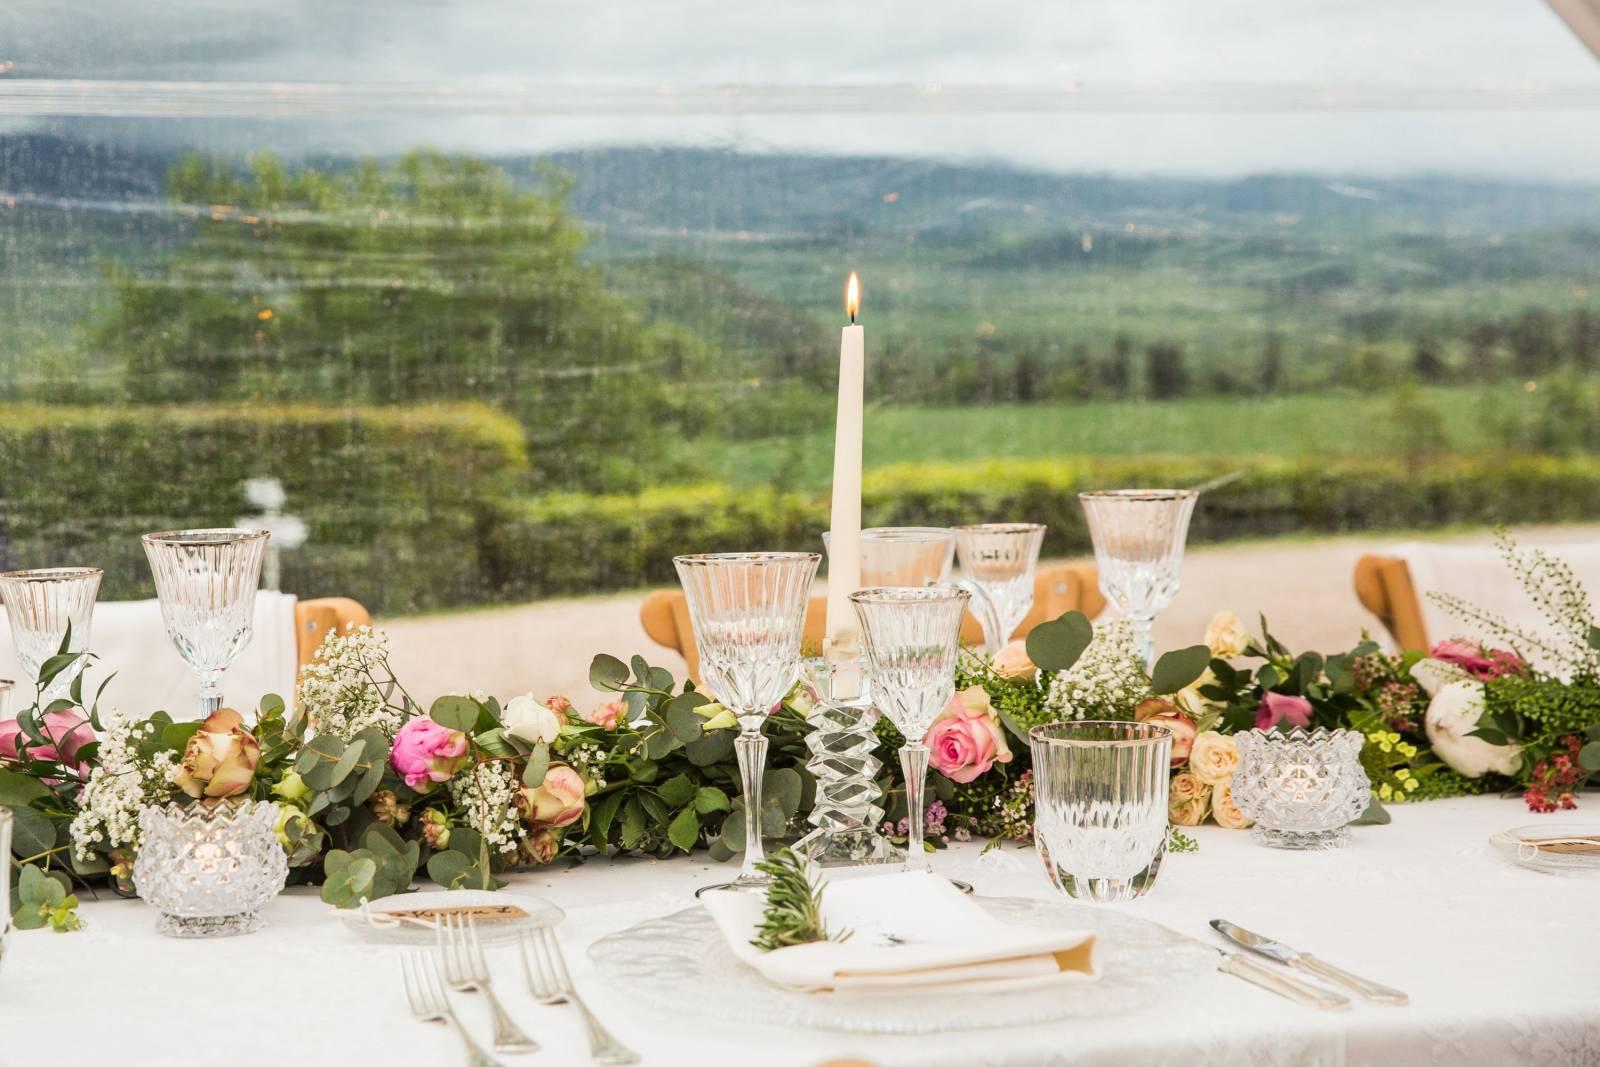 Feriatus - Wedding Planner - Event Planner - House of Weddings - 28